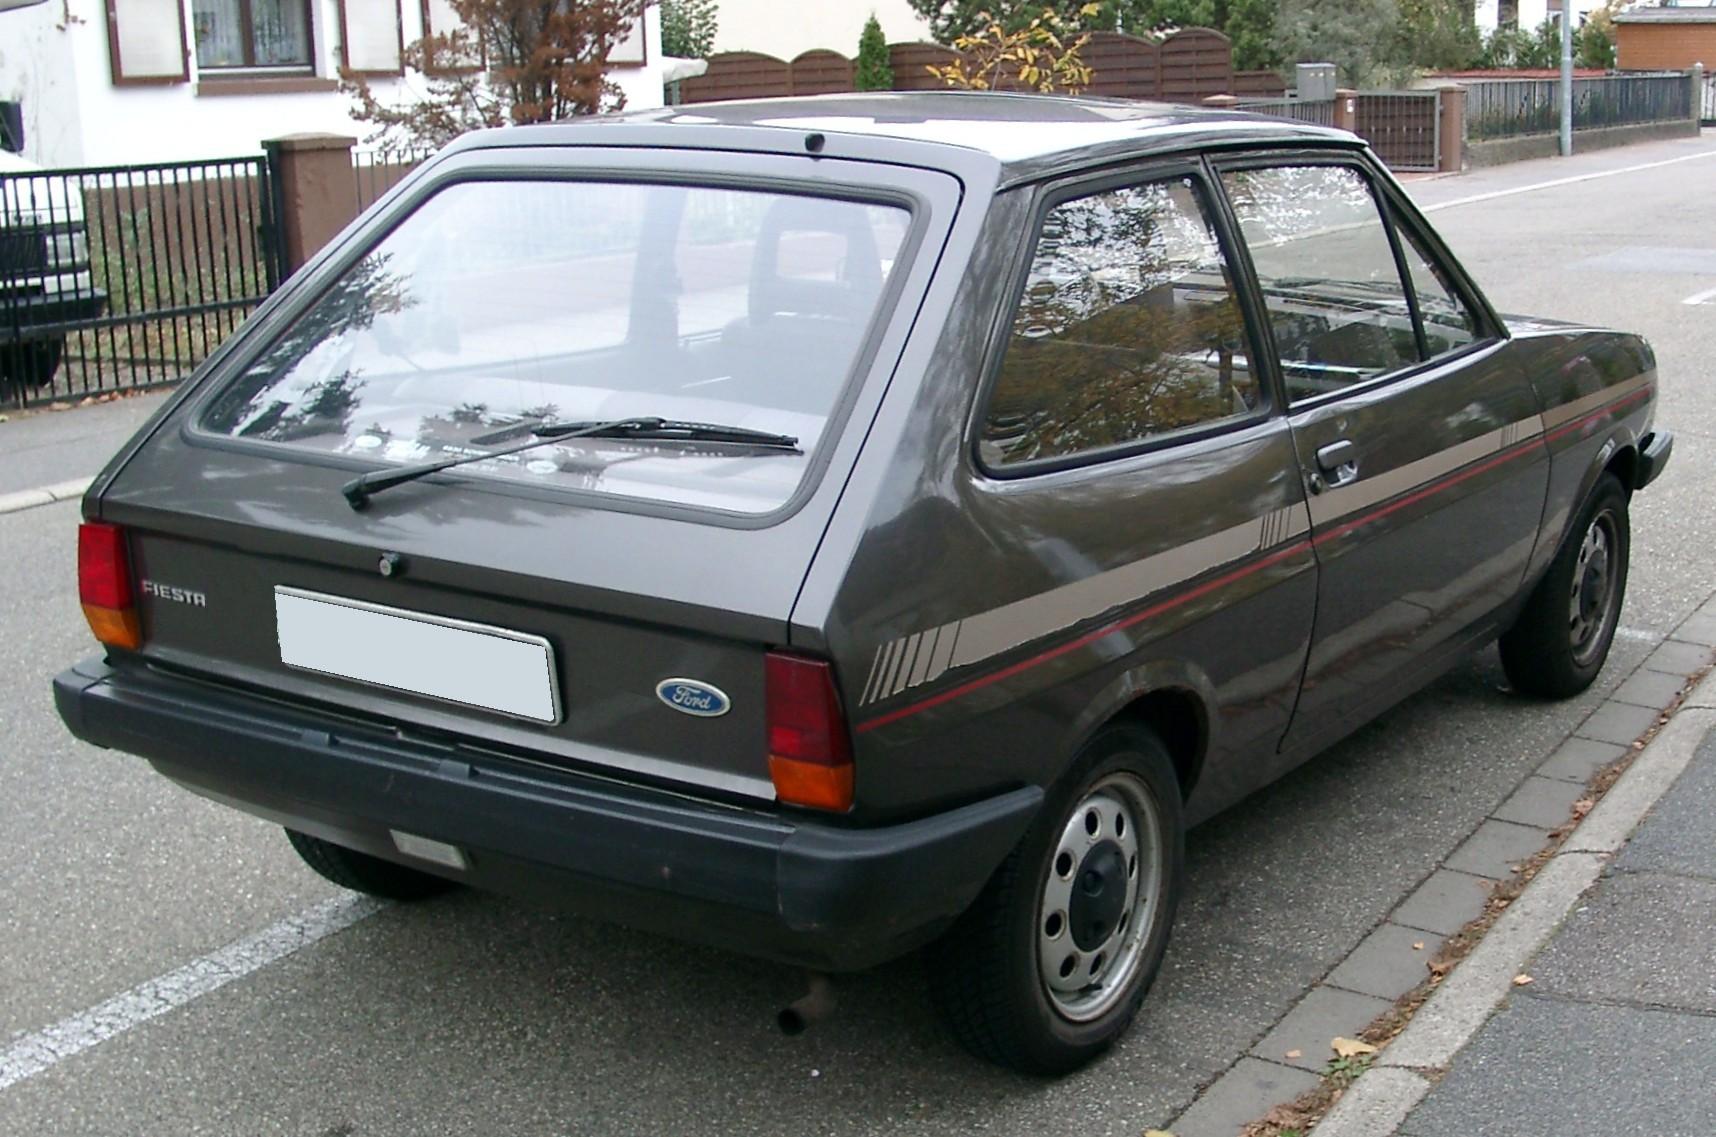 Ford Fiesta Mk1 1976 - 1983 Hatchback 3 door #5